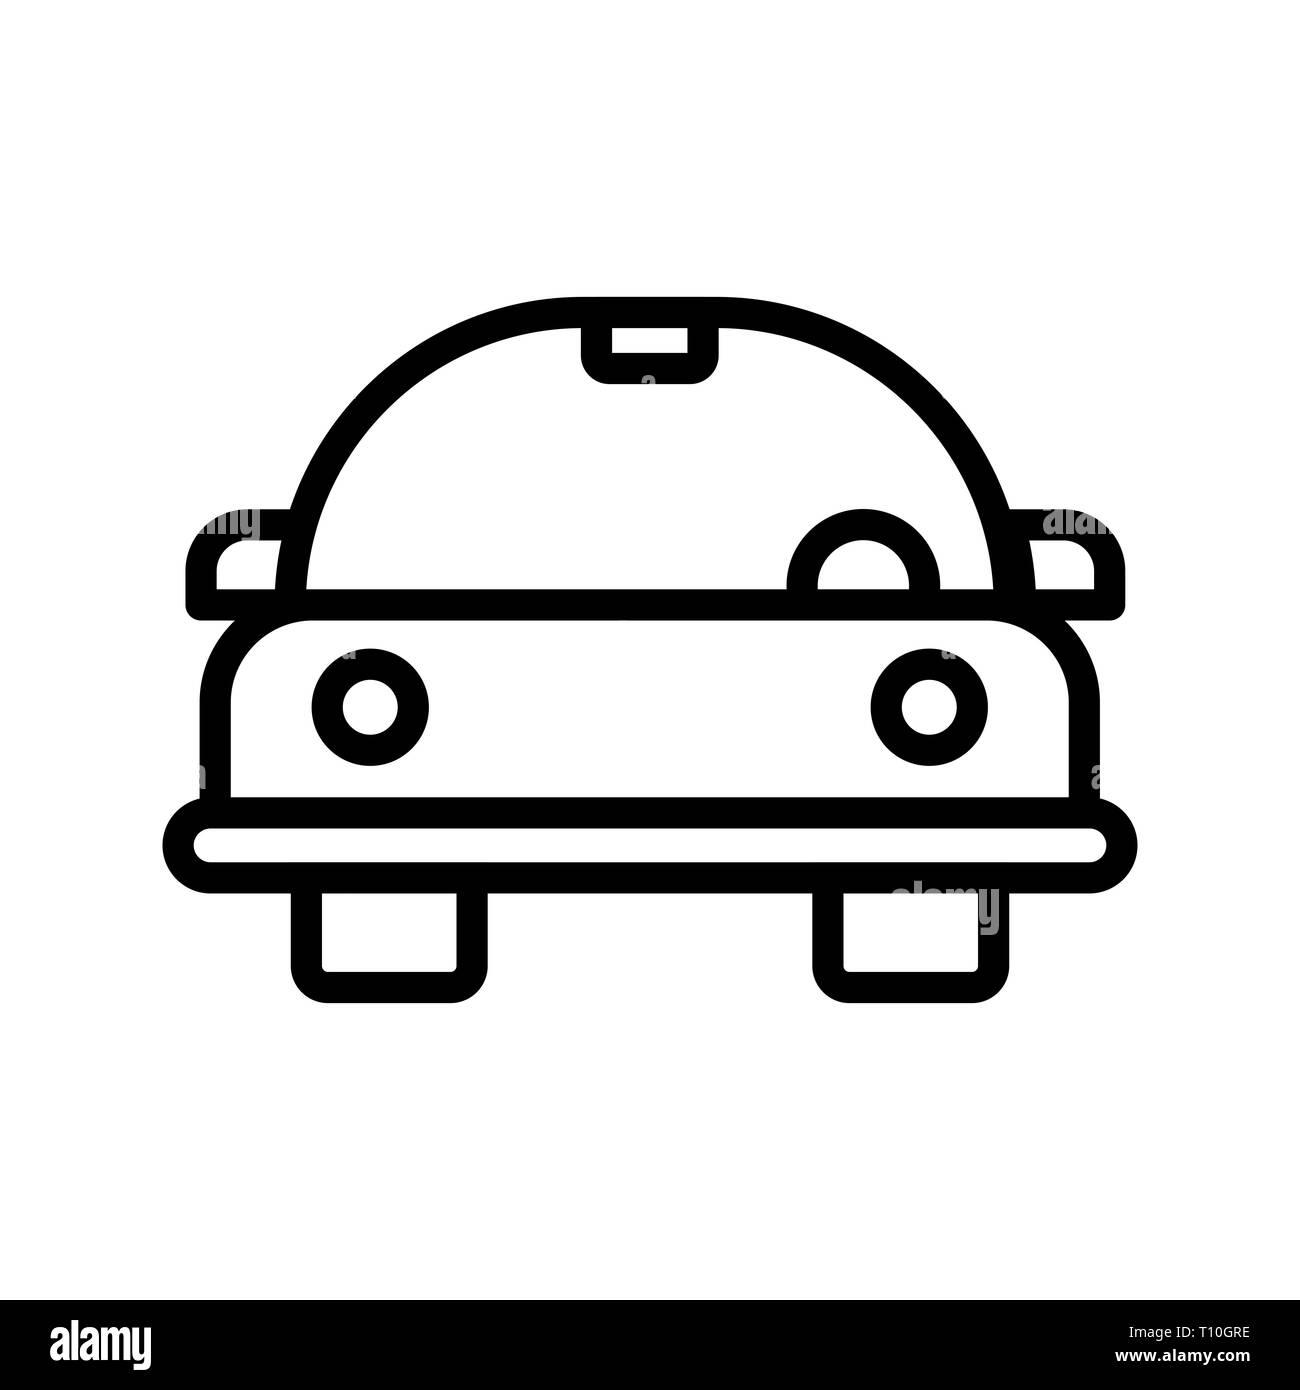 cartoon car line drawing